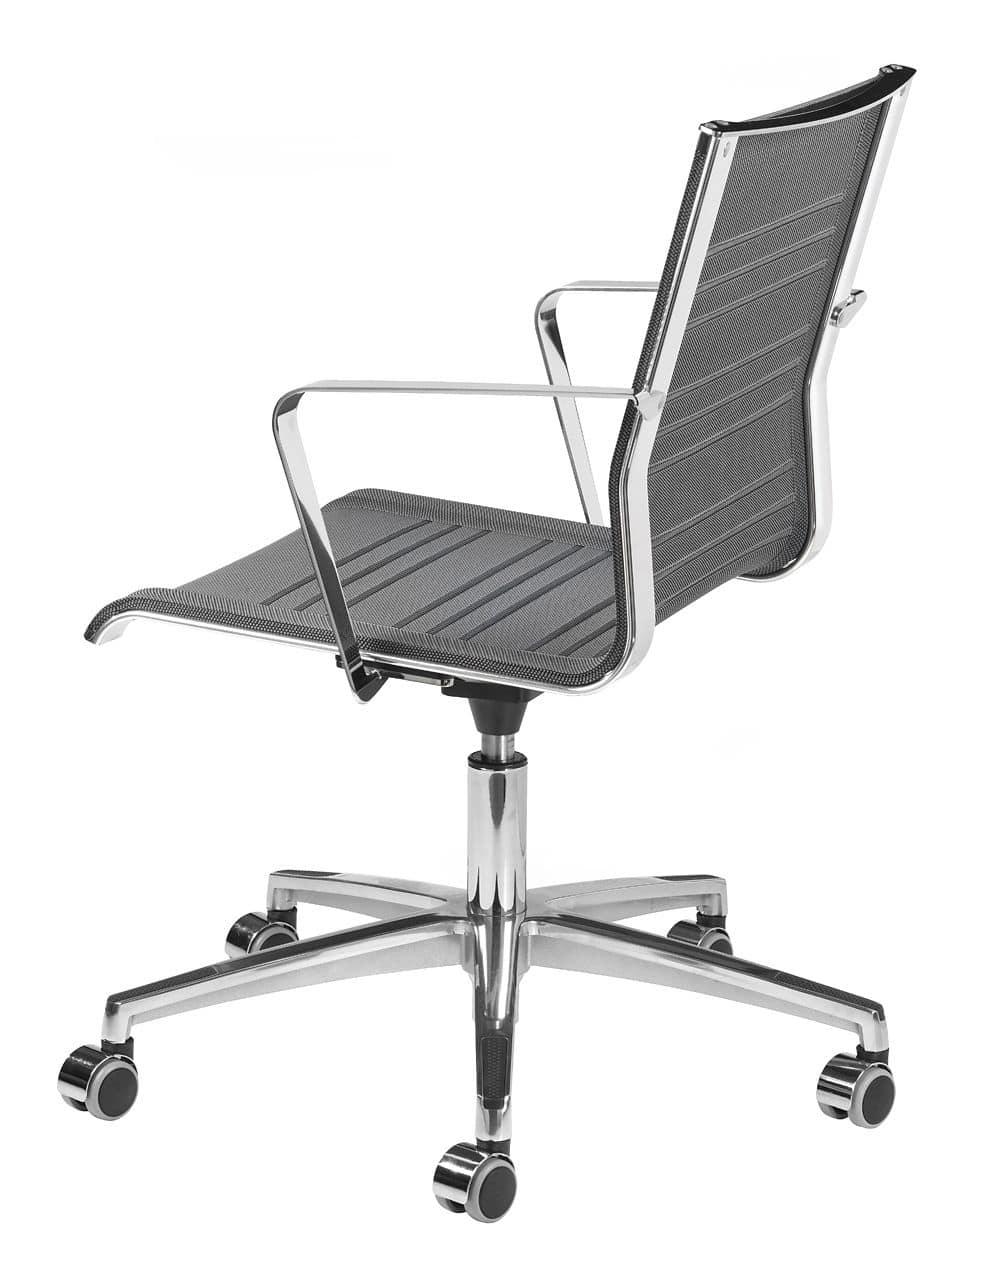 KEYPLUS 3152, Task chair with wheels, chromed metal frame